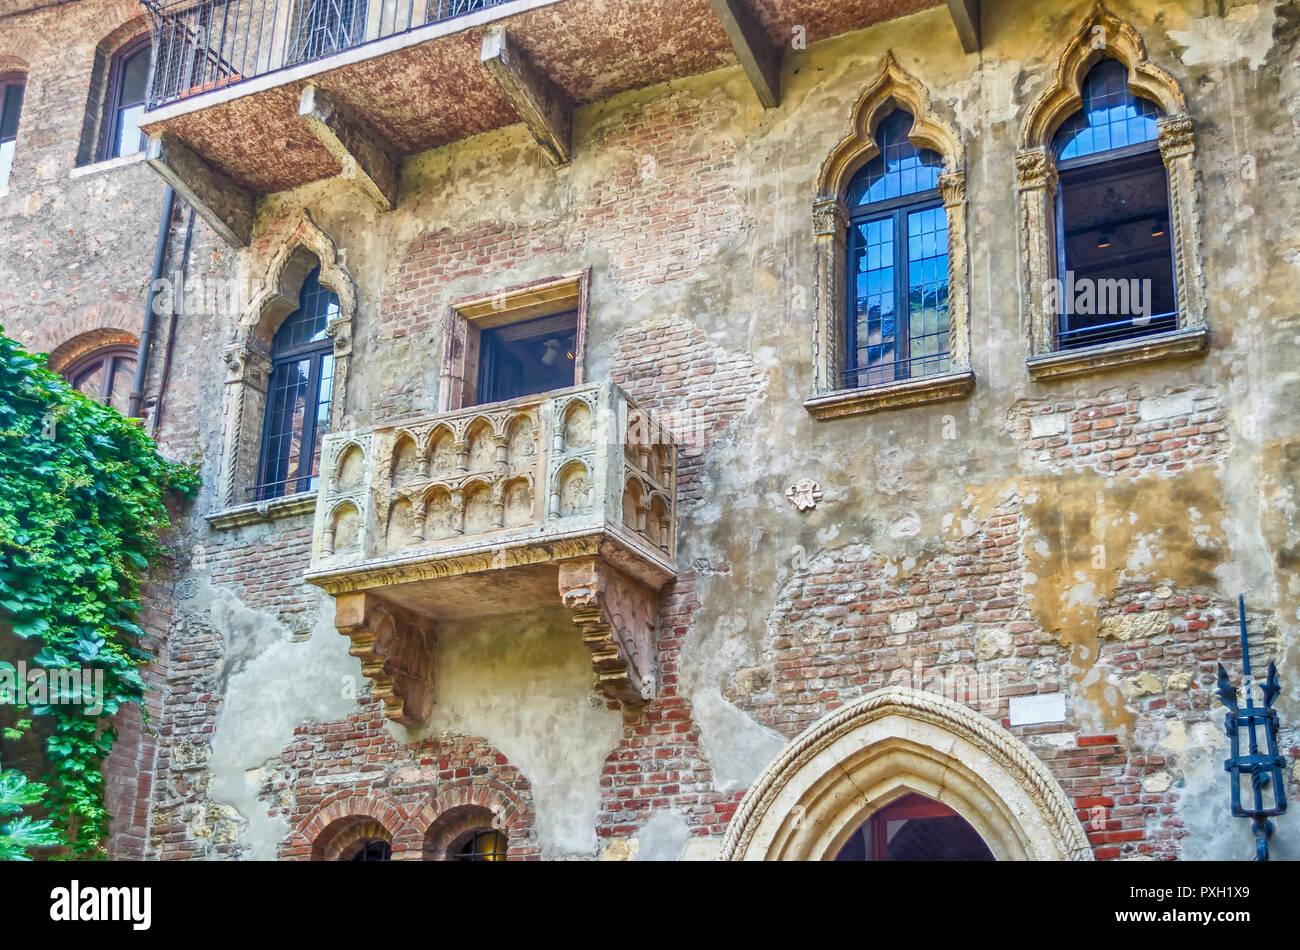 Der Beruhmte Balkon Von Romeo Und Julia In Der Casa Di Giulietta In